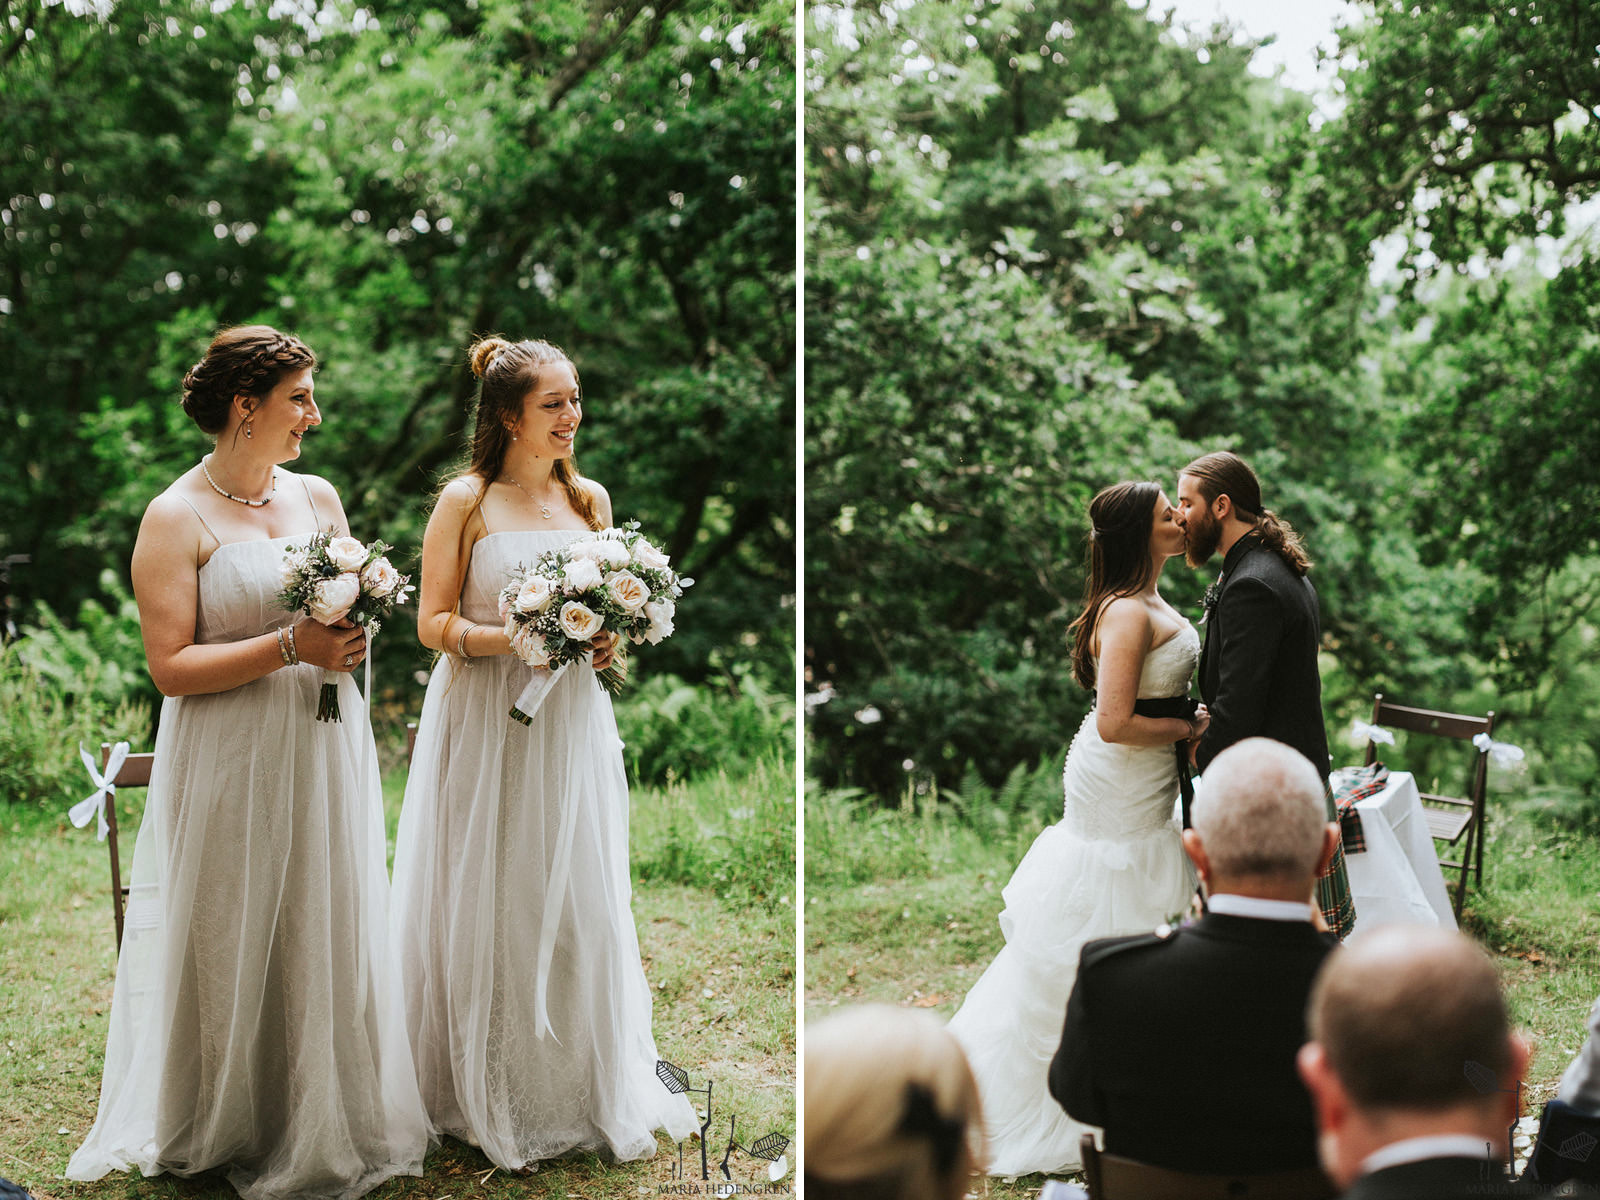 Comrie Croft Weddings